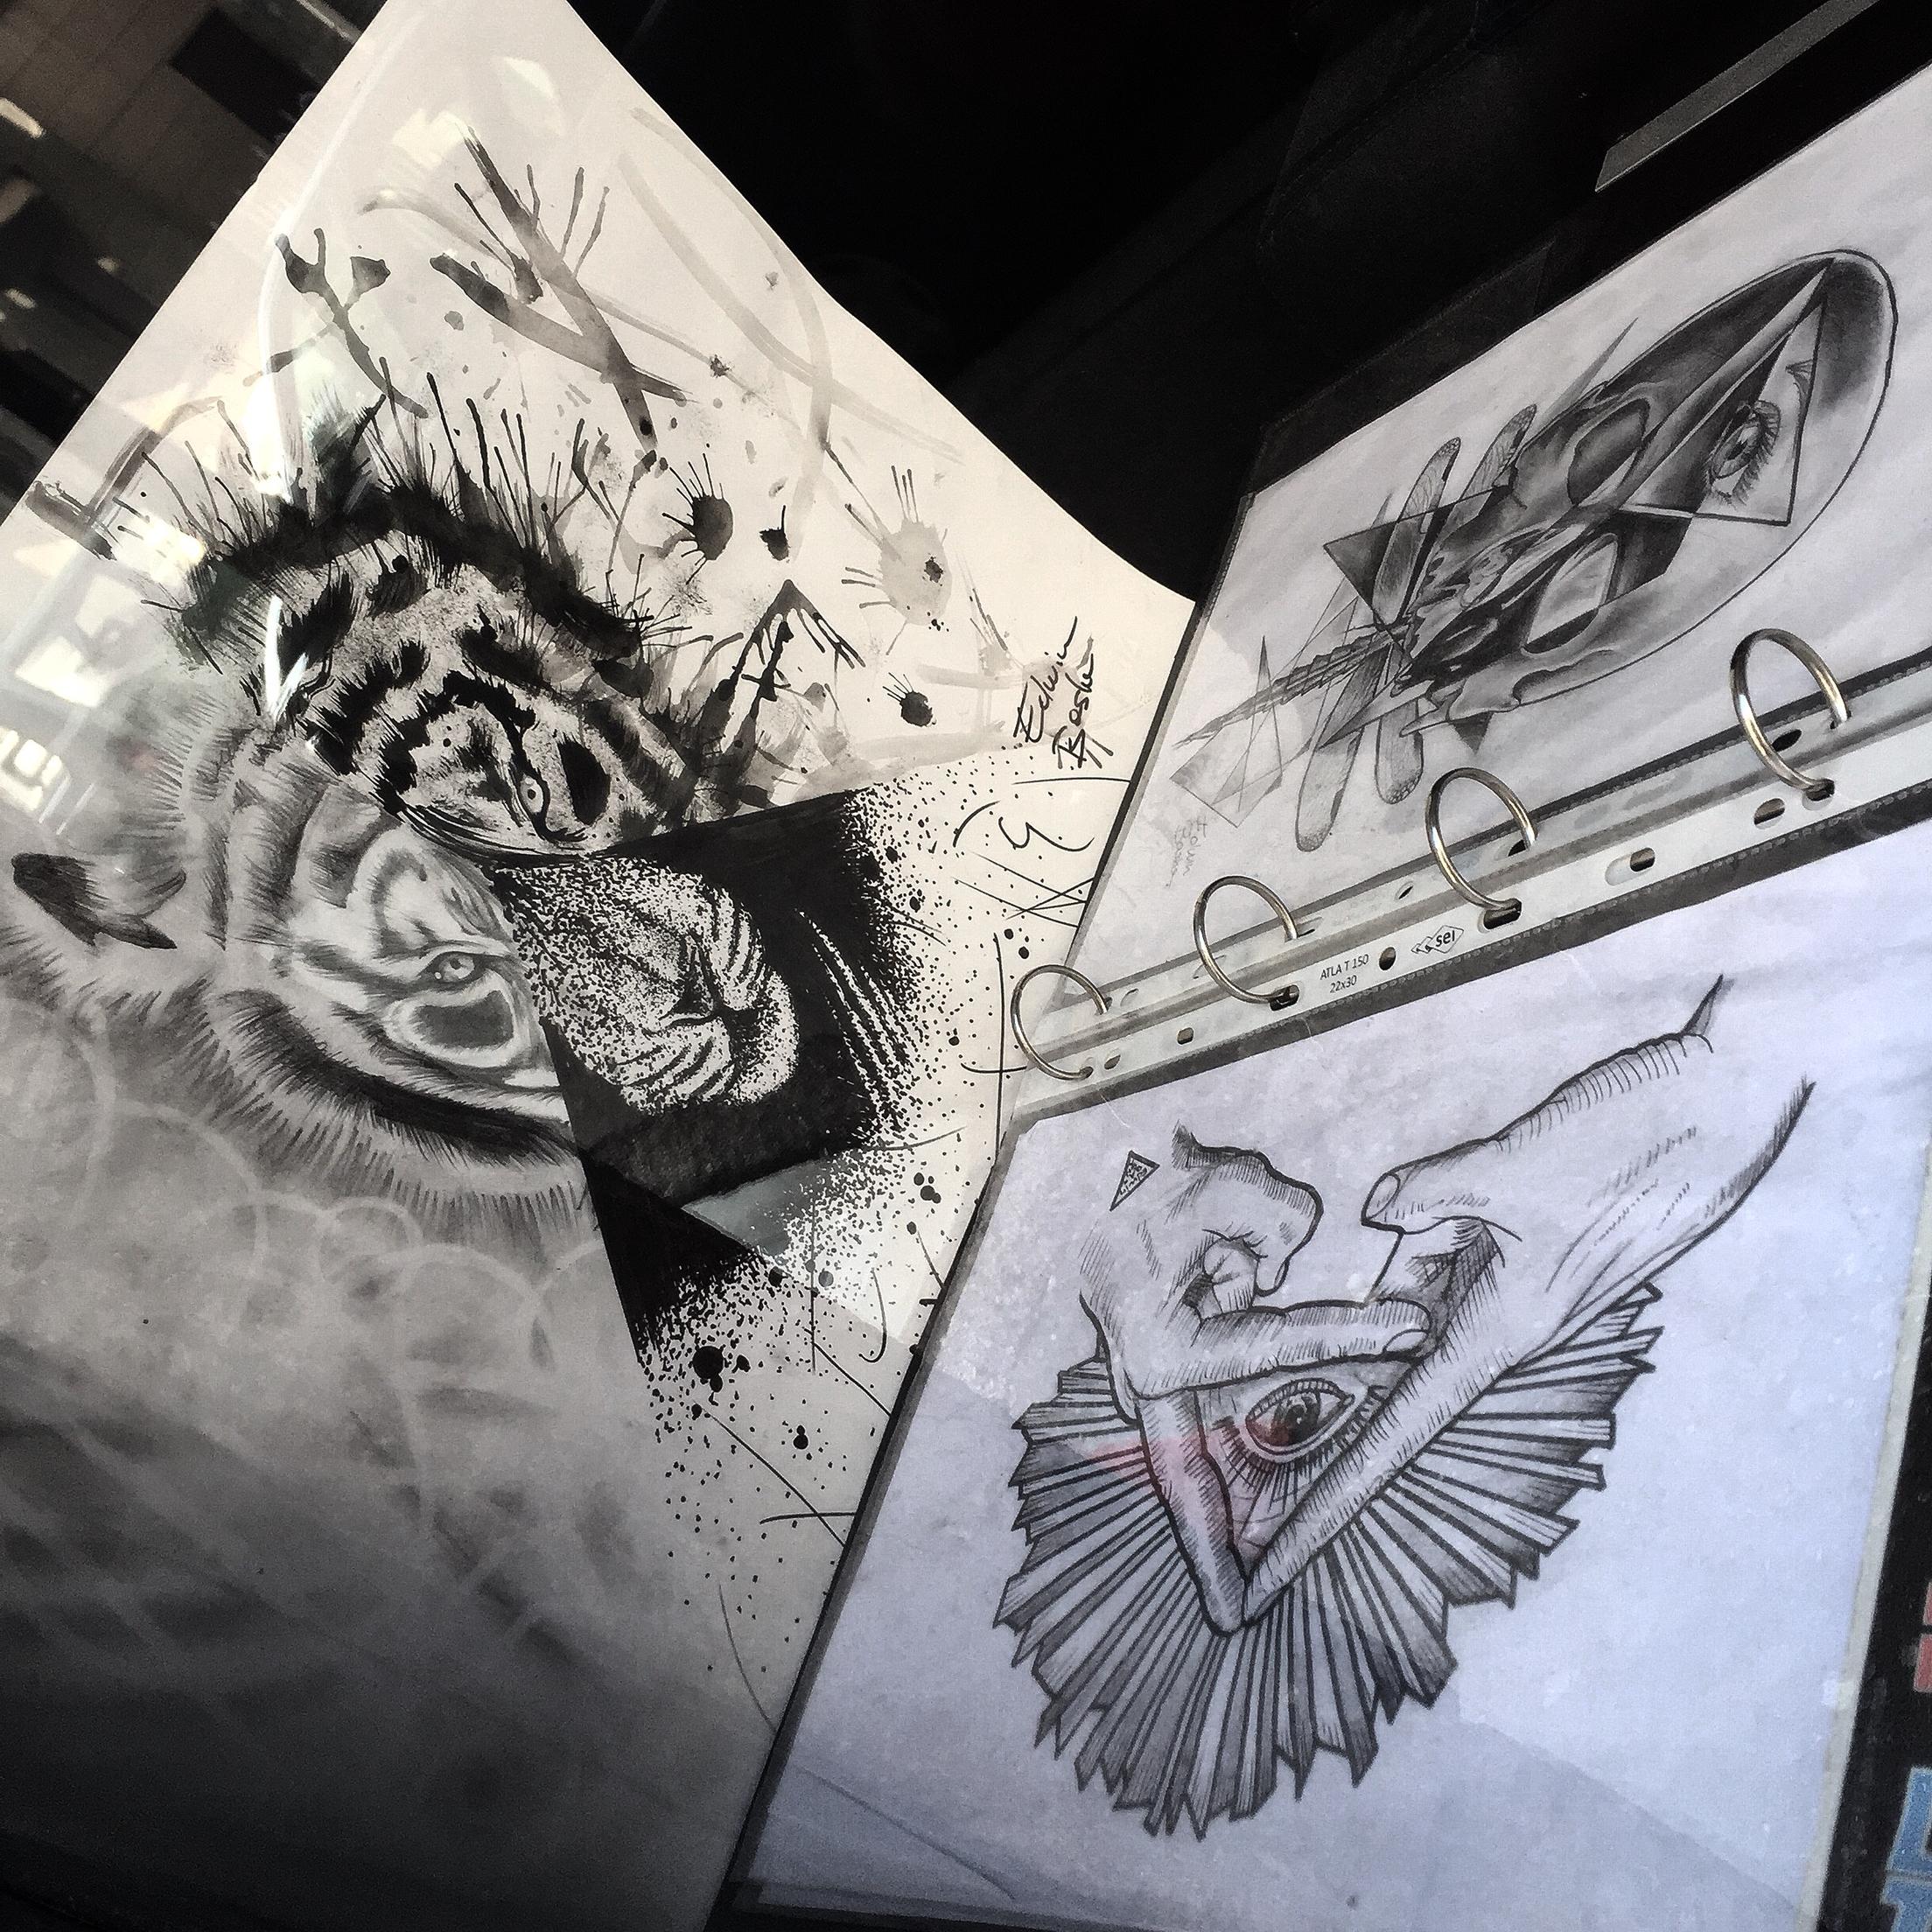 Drawn illuminati target Occhio watercolor tronangolo teschio illuminati